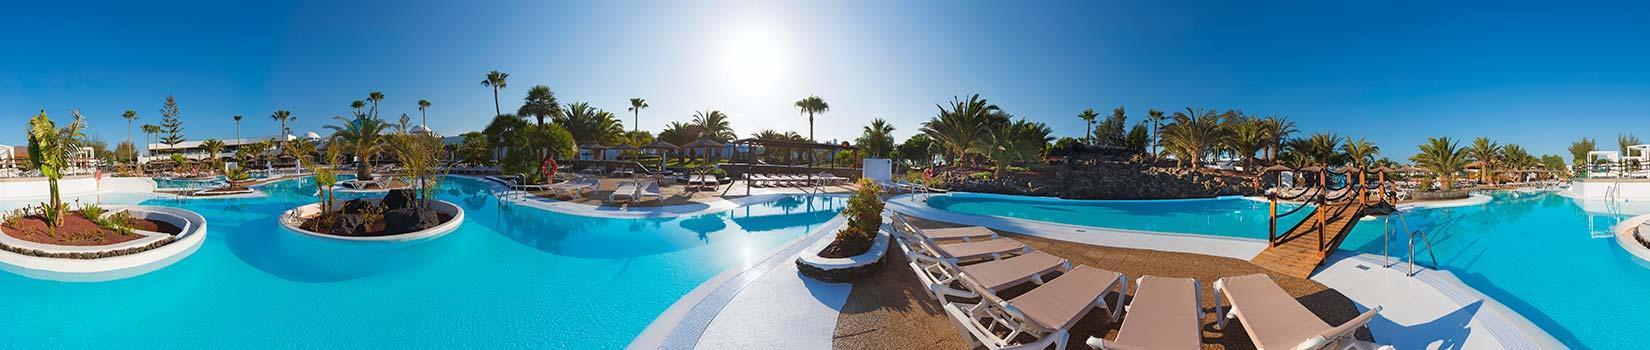 Vista 360 piscina Elba Lanzarote